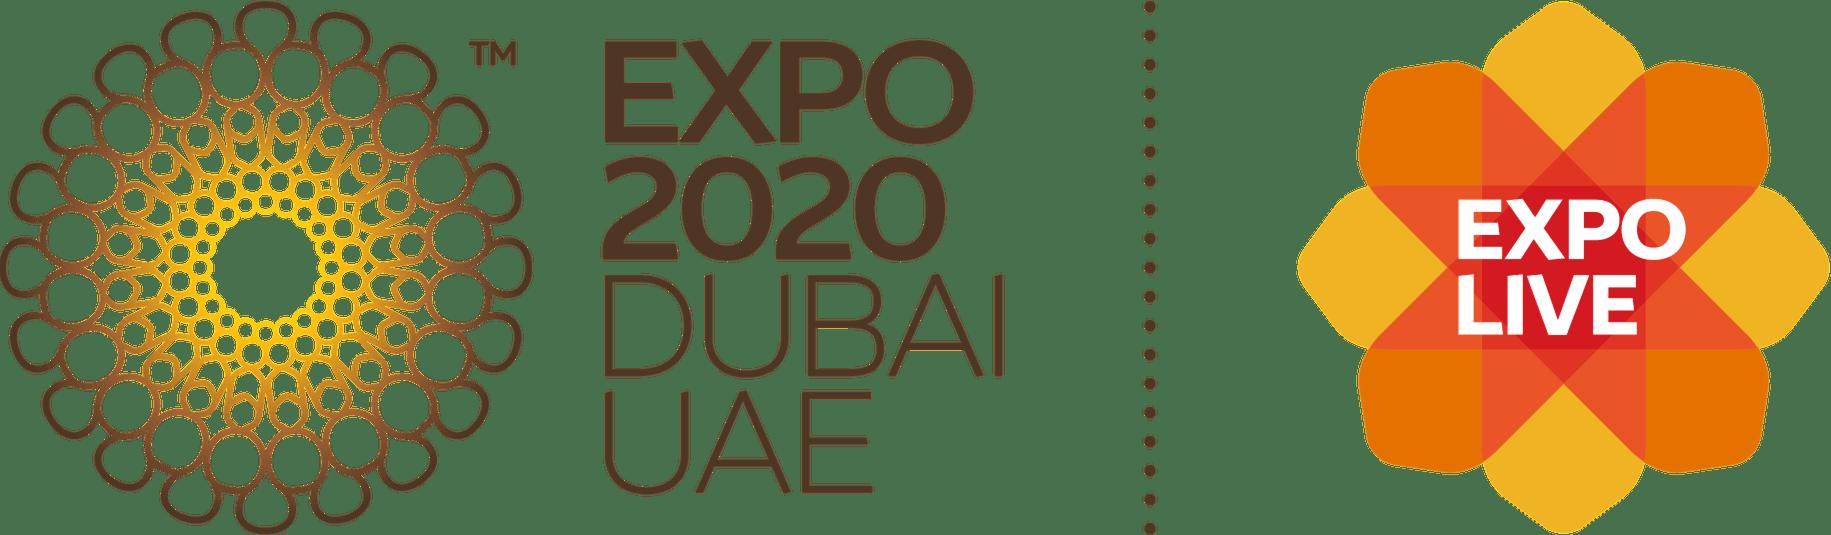 Expo 2020 - AE